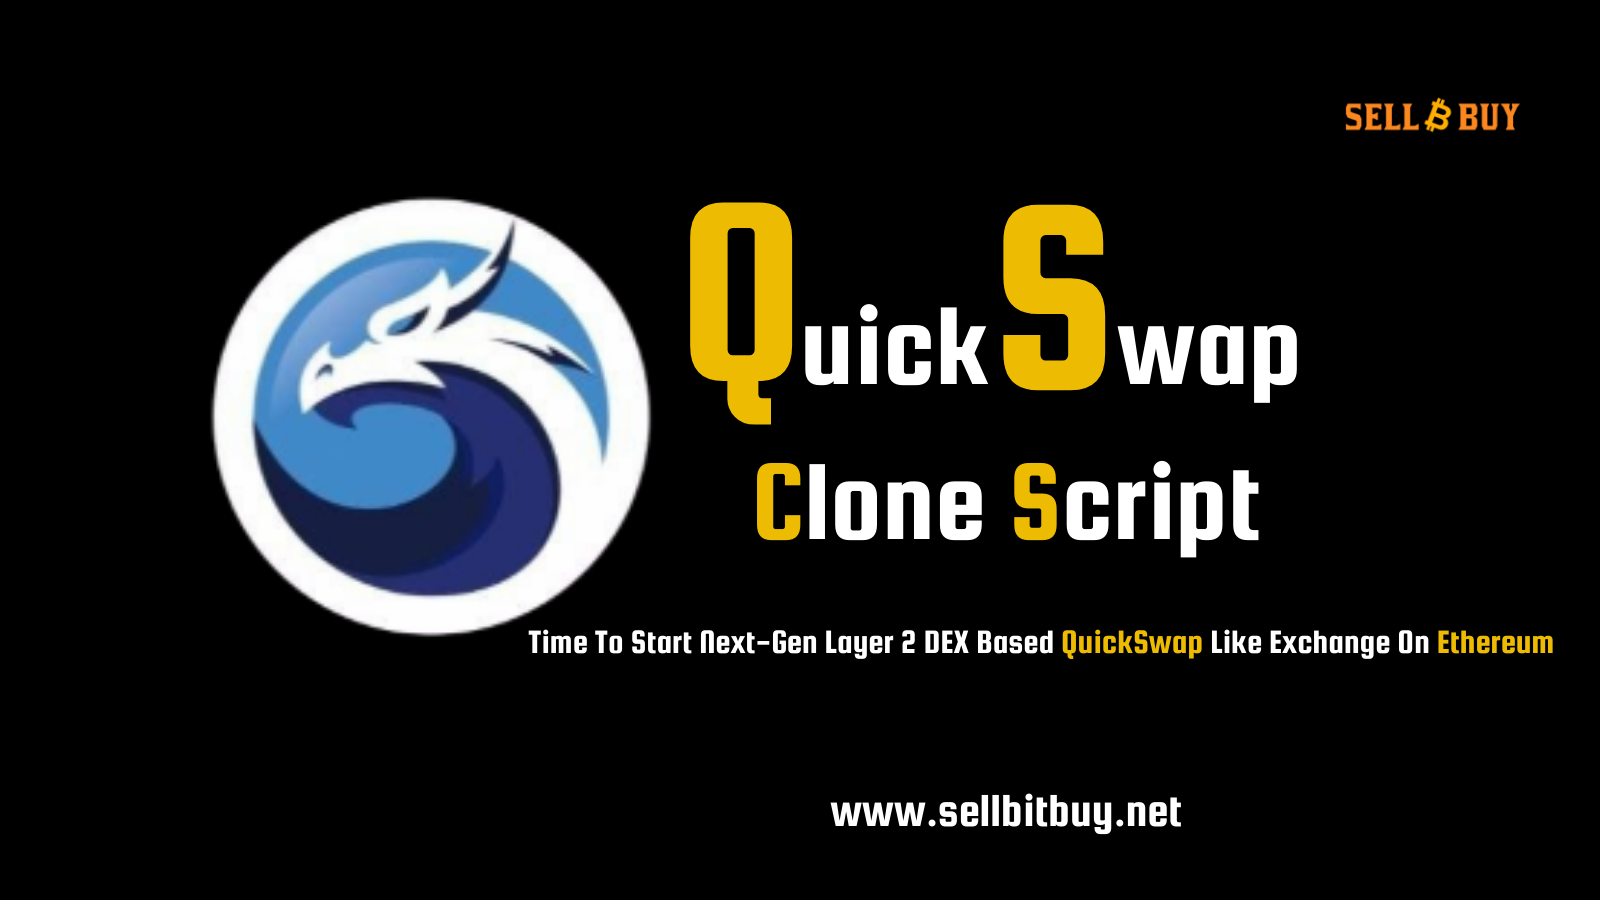 QuickSwap Clone Script - Unique Approach To Launch QuickSwap like Decentralized Exchange On Matic Blockchain